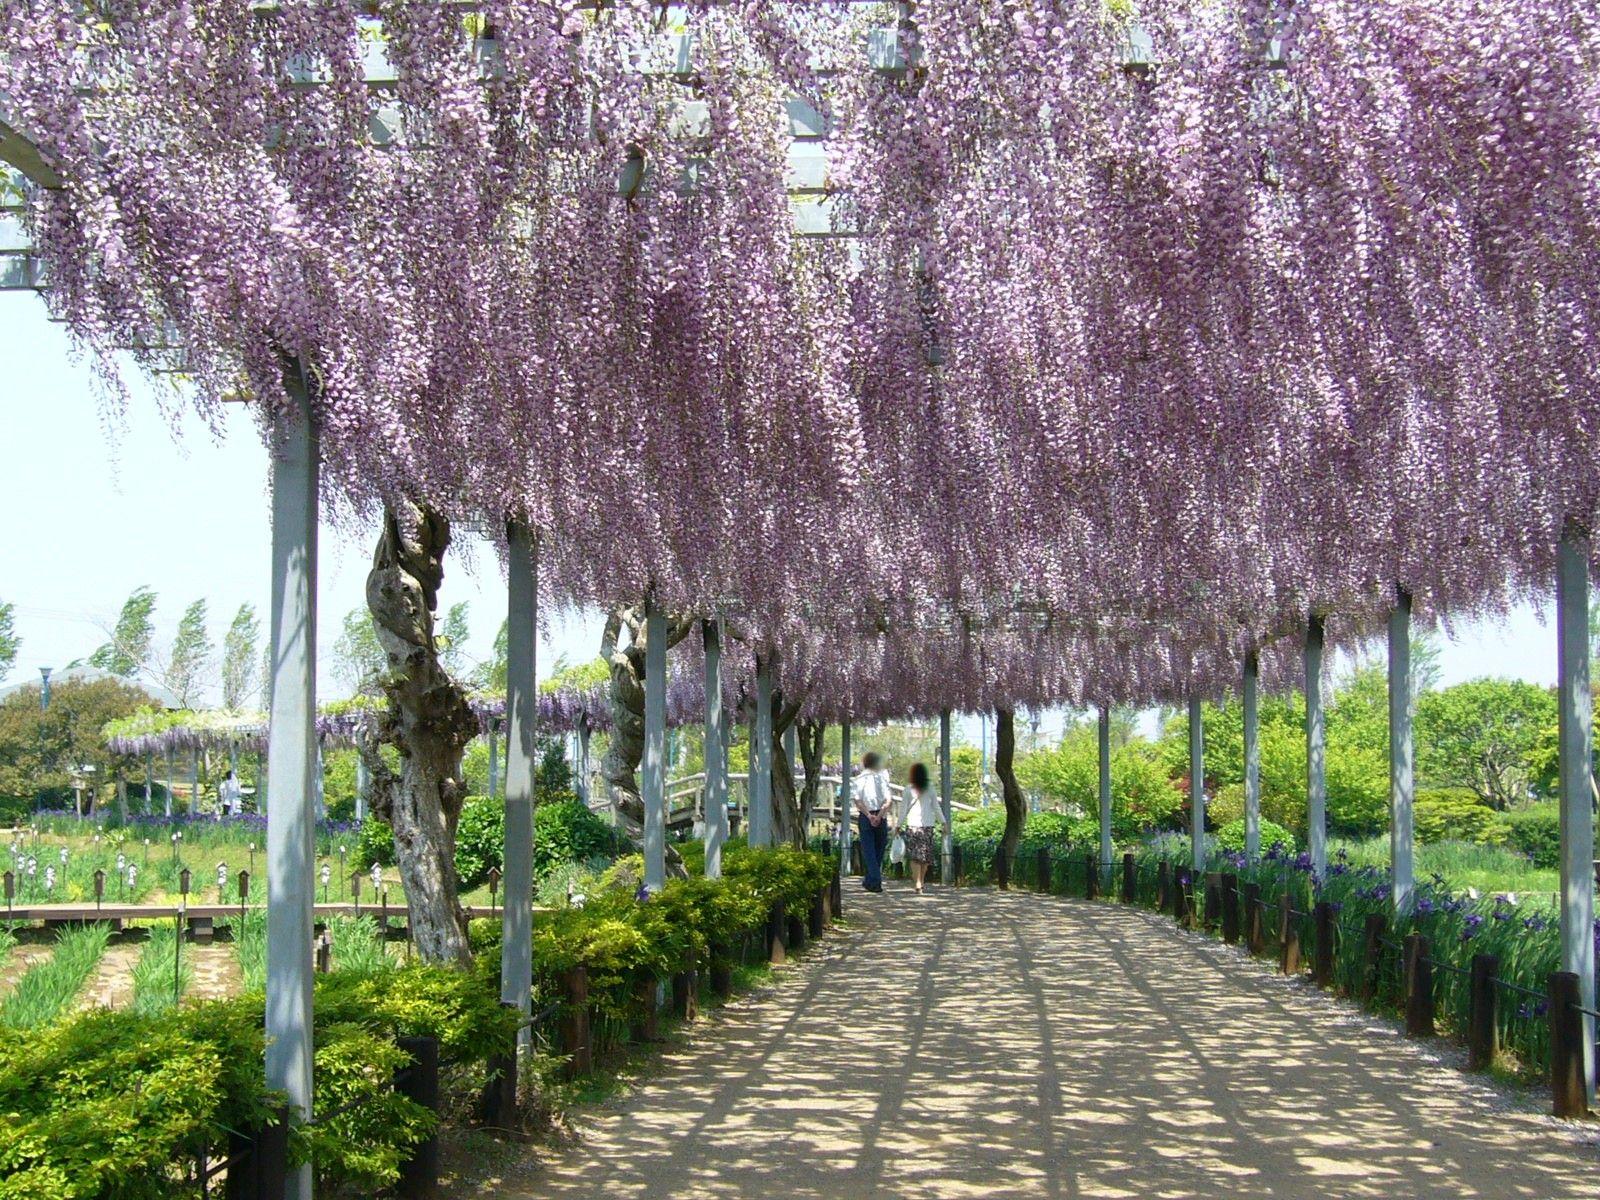 Lilaakac Szep Kepeken Szep Kepek Minden Temaban In 2020 Wisteria Plant Trellis Plants Wisteria Tree